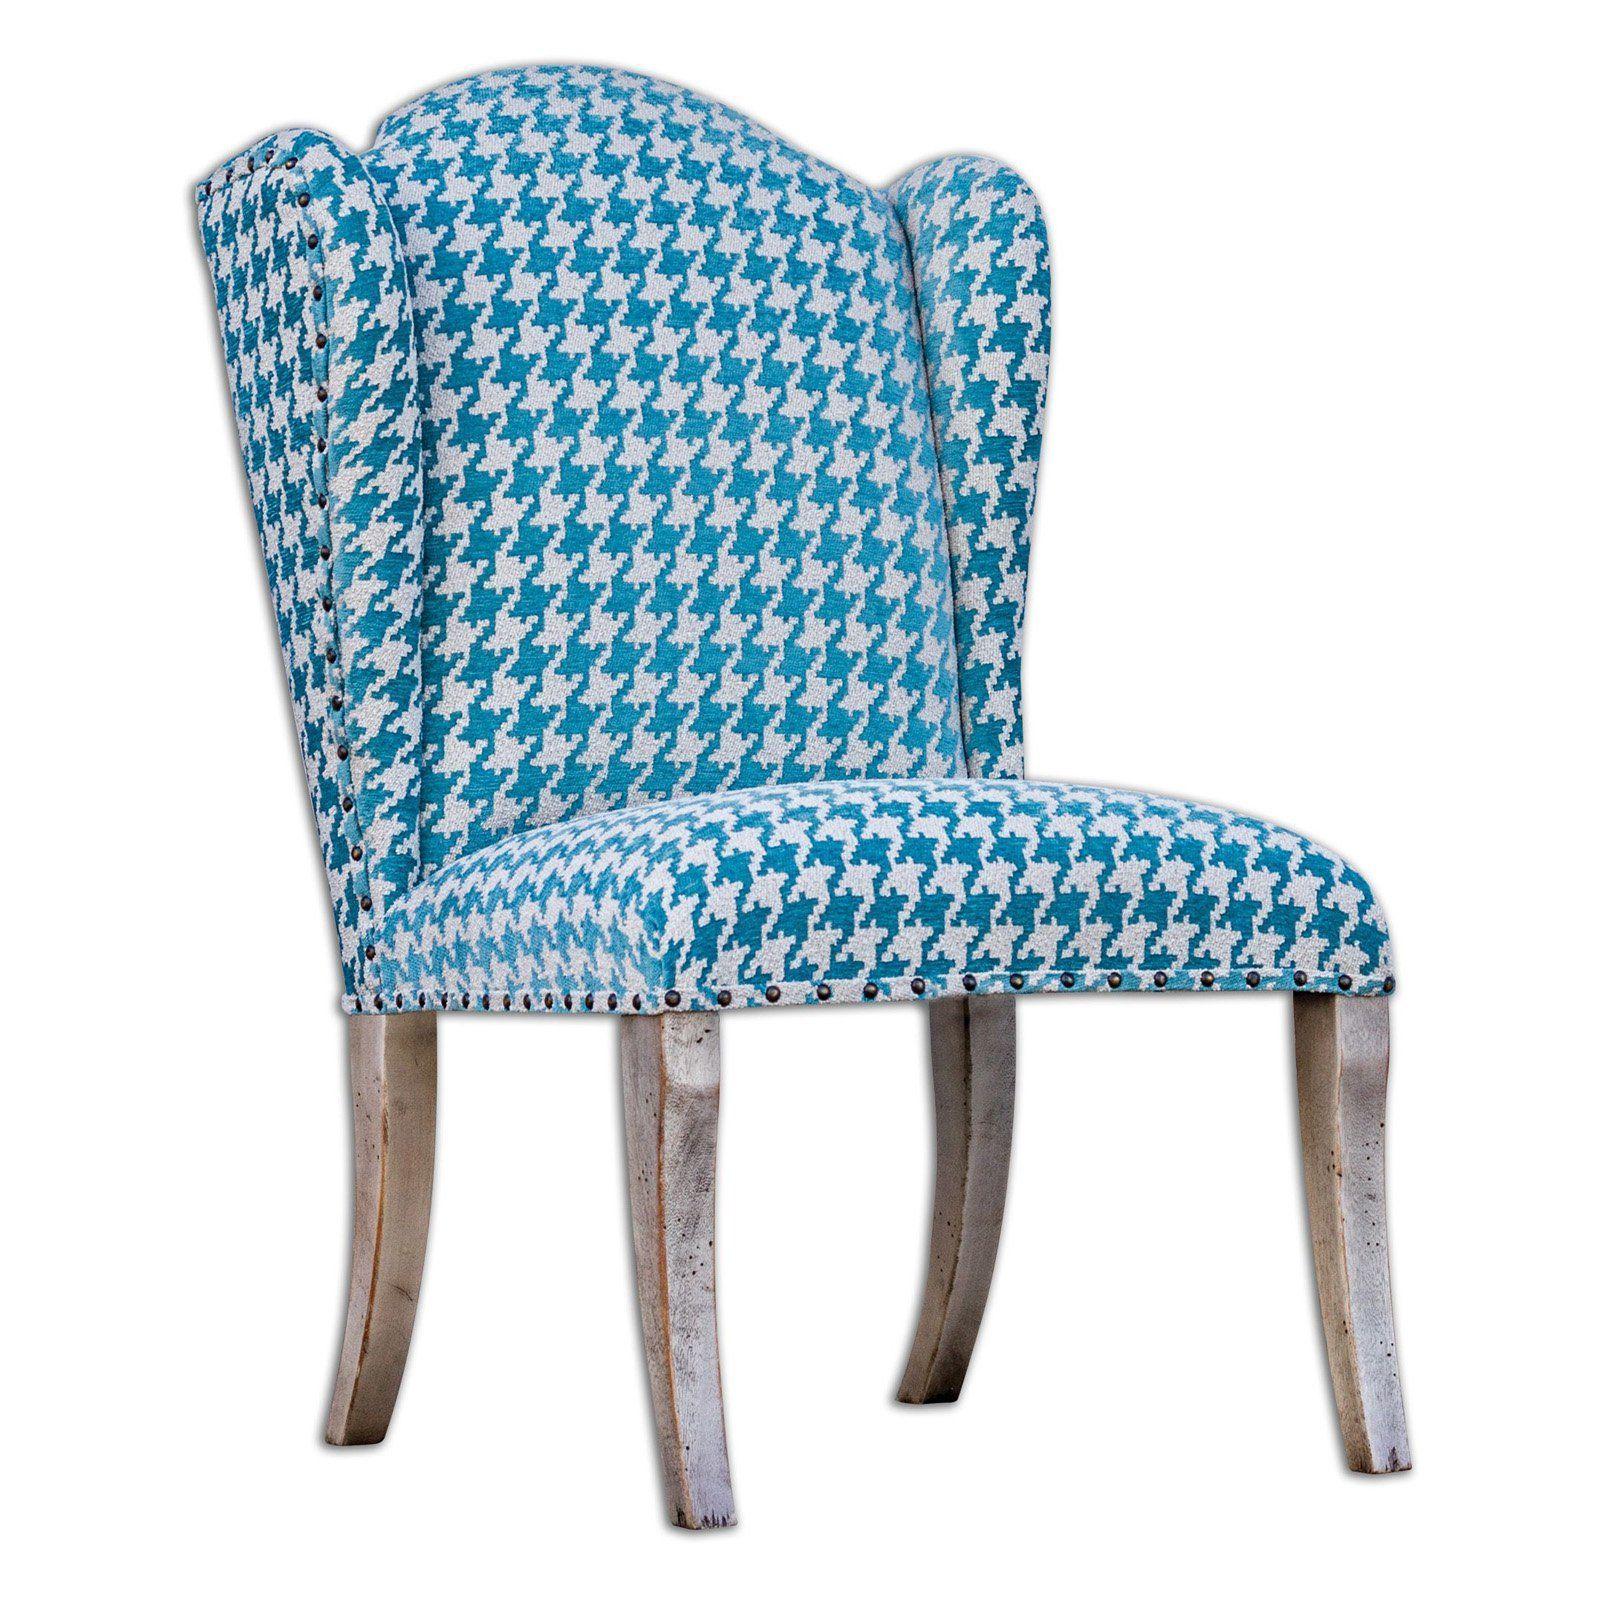 Direct Express Zossen Ivory Accent Chair: Uttermost Winesett Wingback Chair - 23618